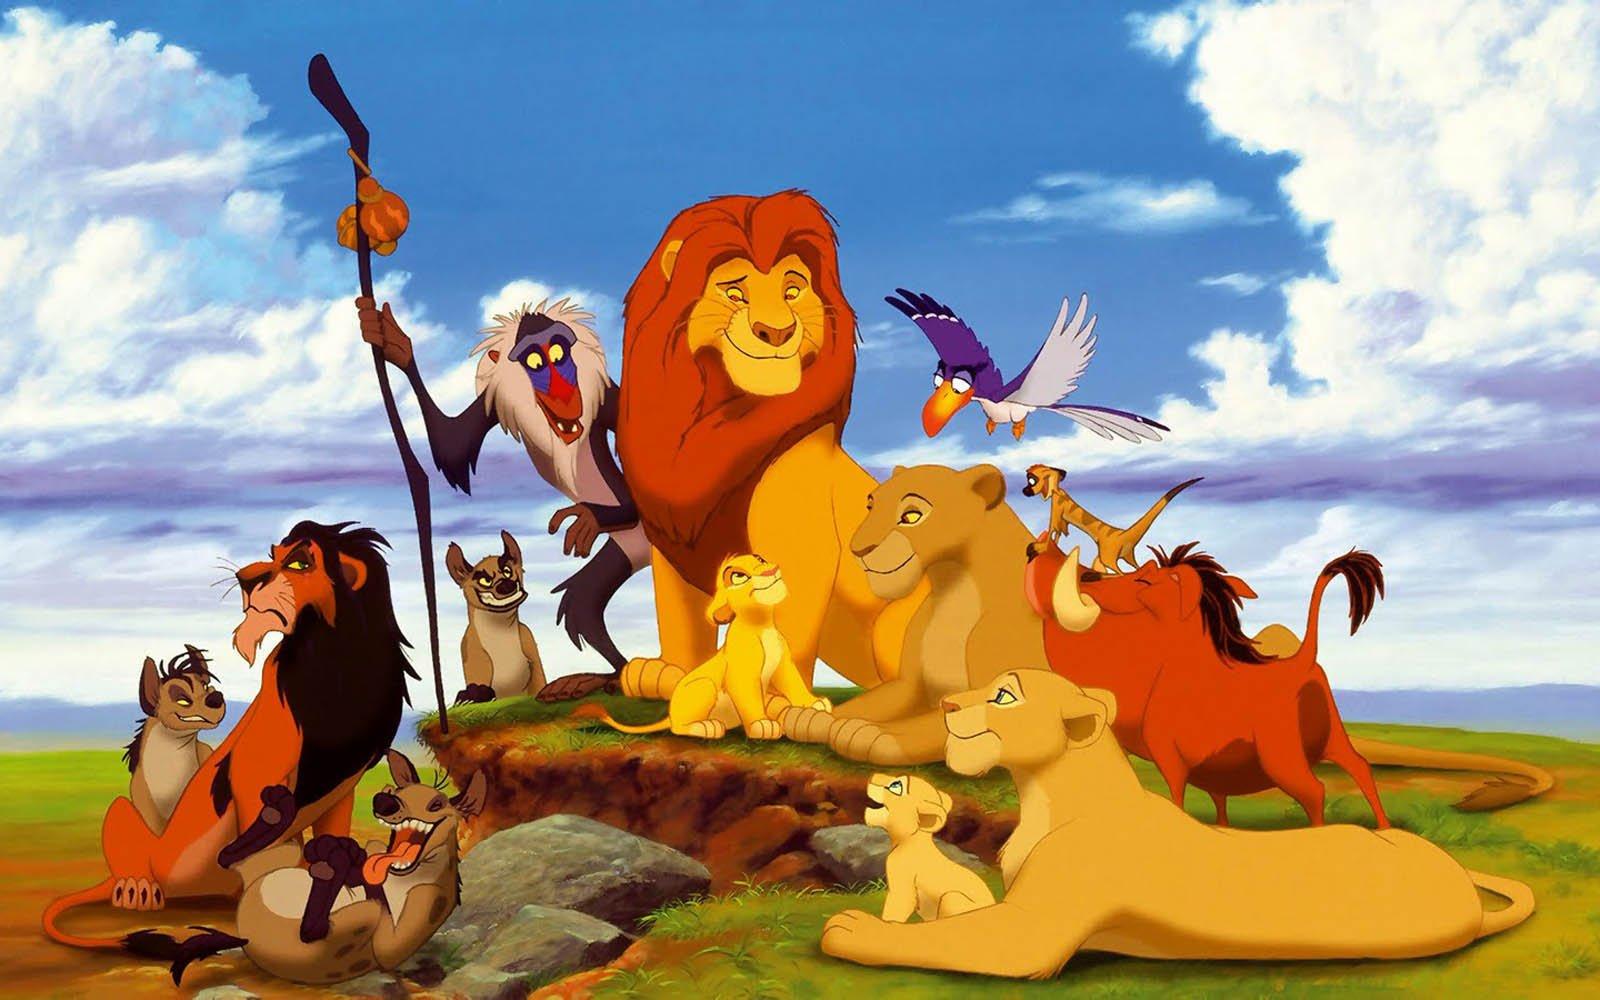 King Desktop Wallpapers The Lion King Desktop Backgrounds The Lion 1600x1000